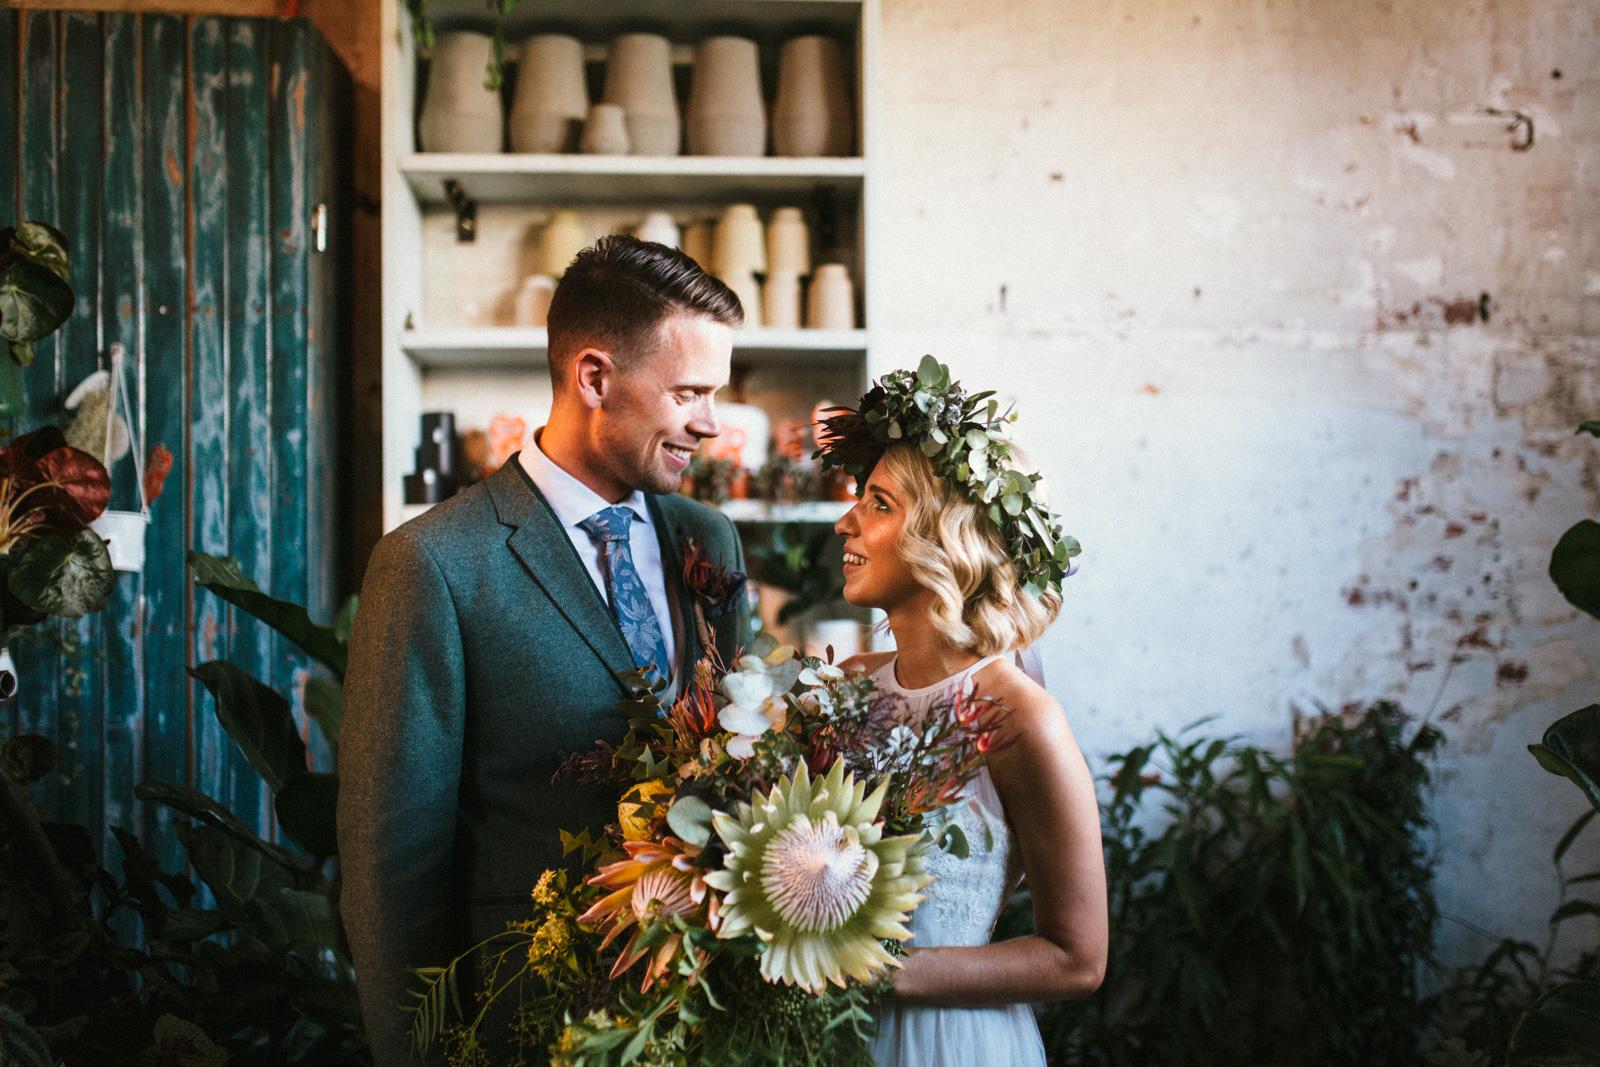 D+S-Melbourne Wedding Photographer-Glasshaus-Dean Raphael-73.jpg